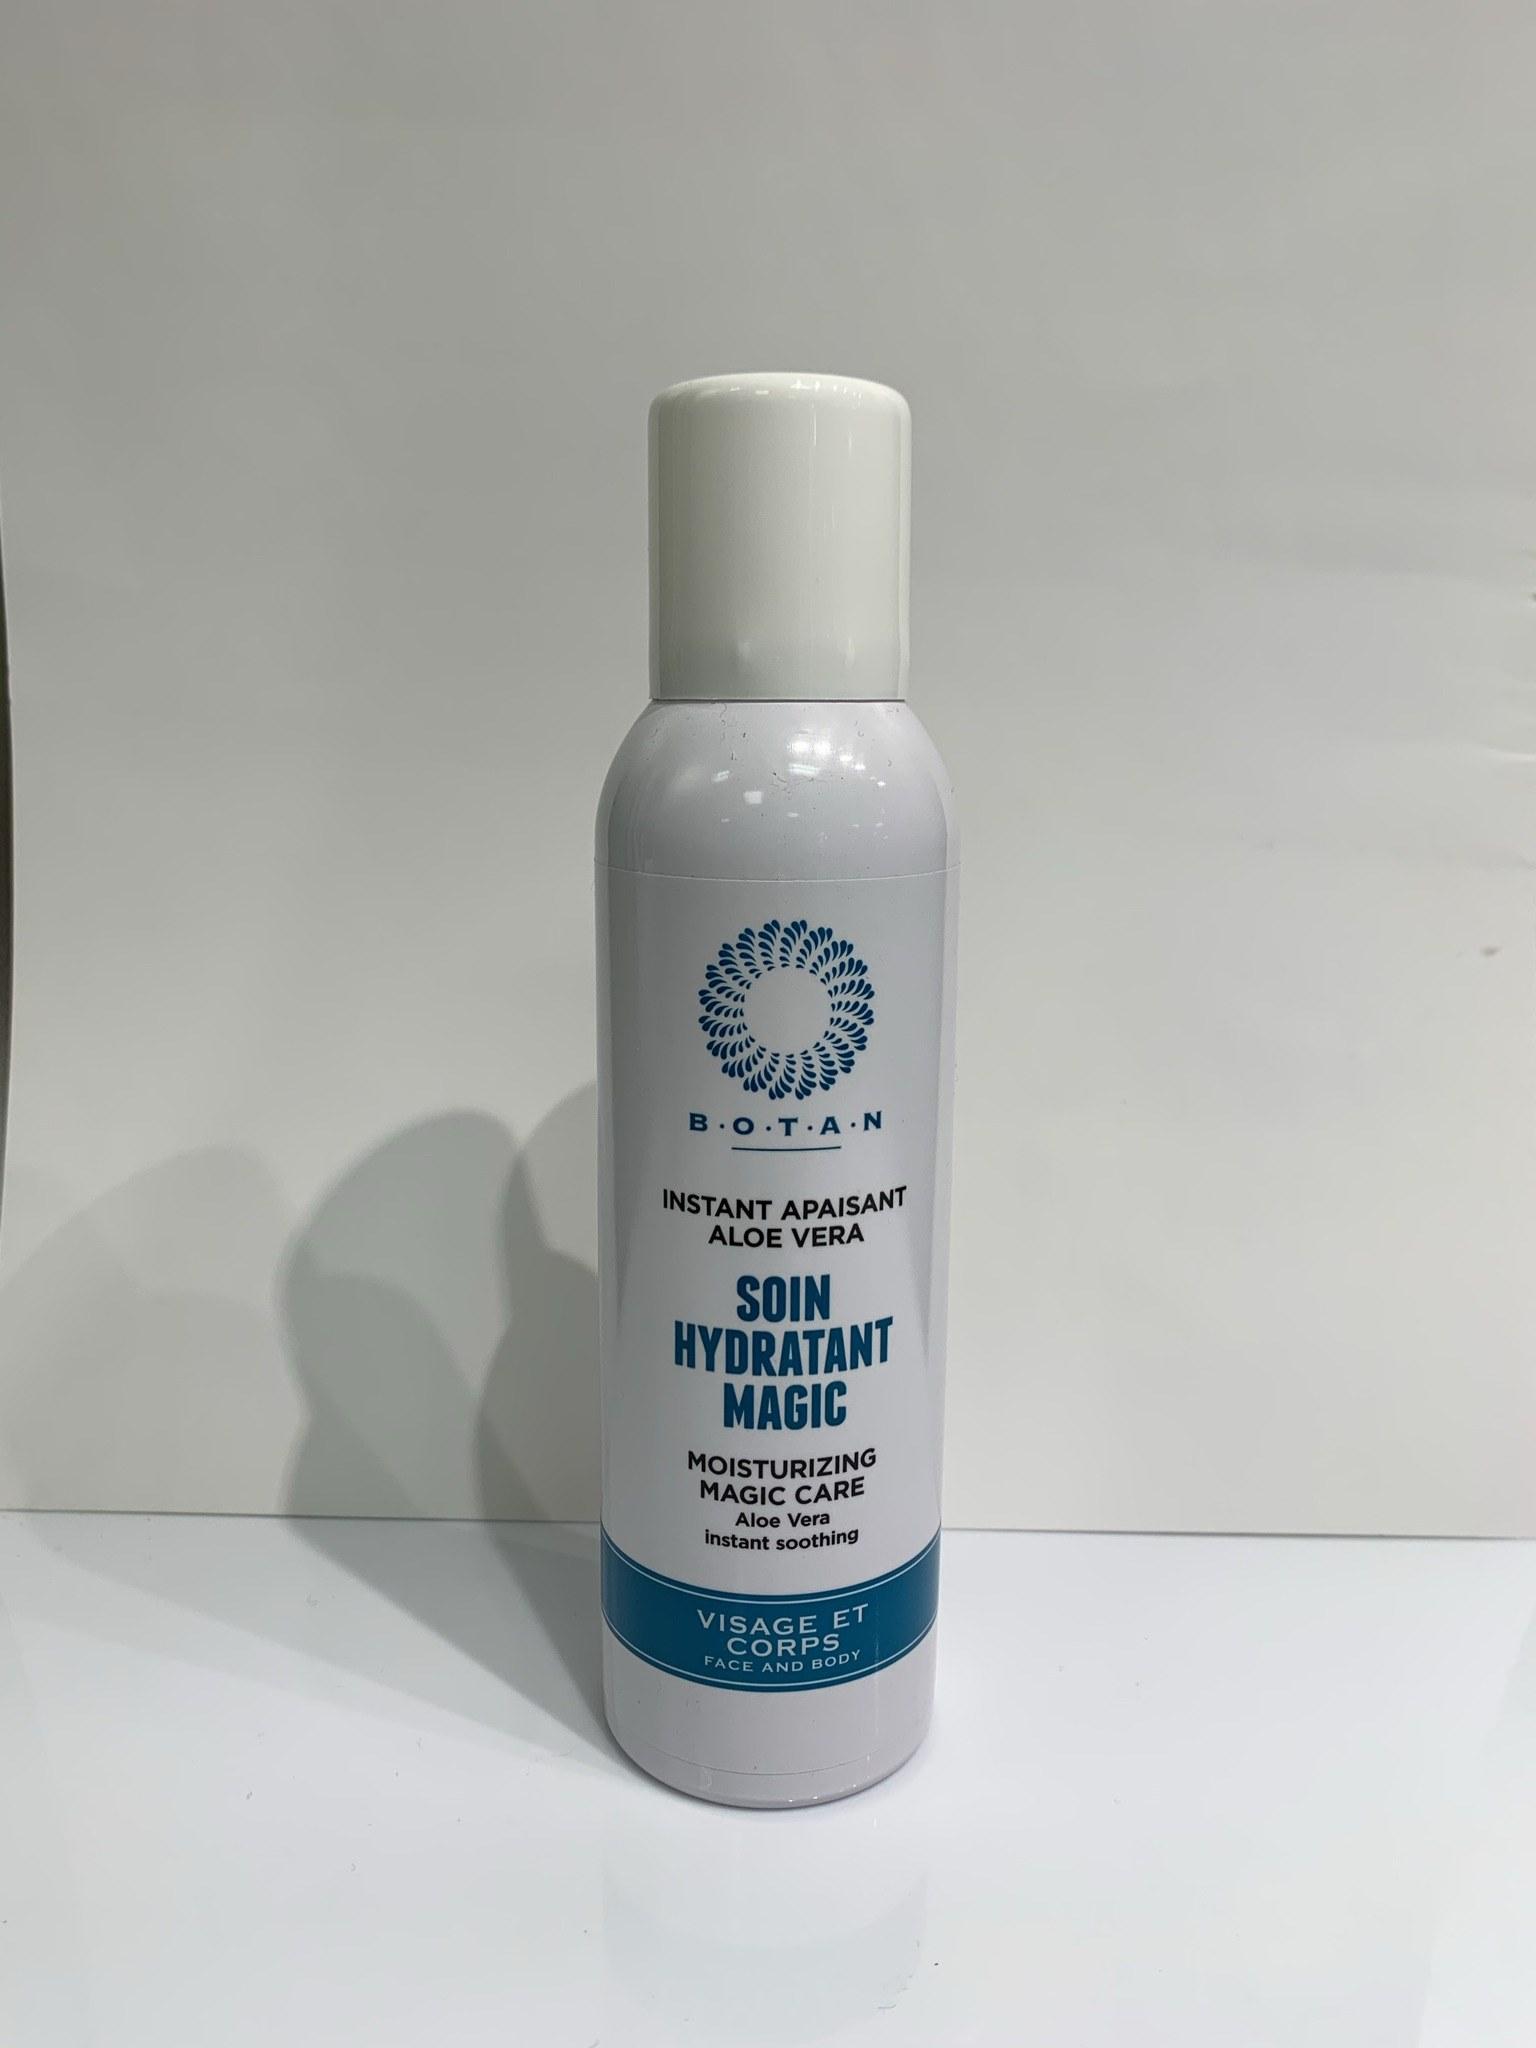 soin hydratant magic